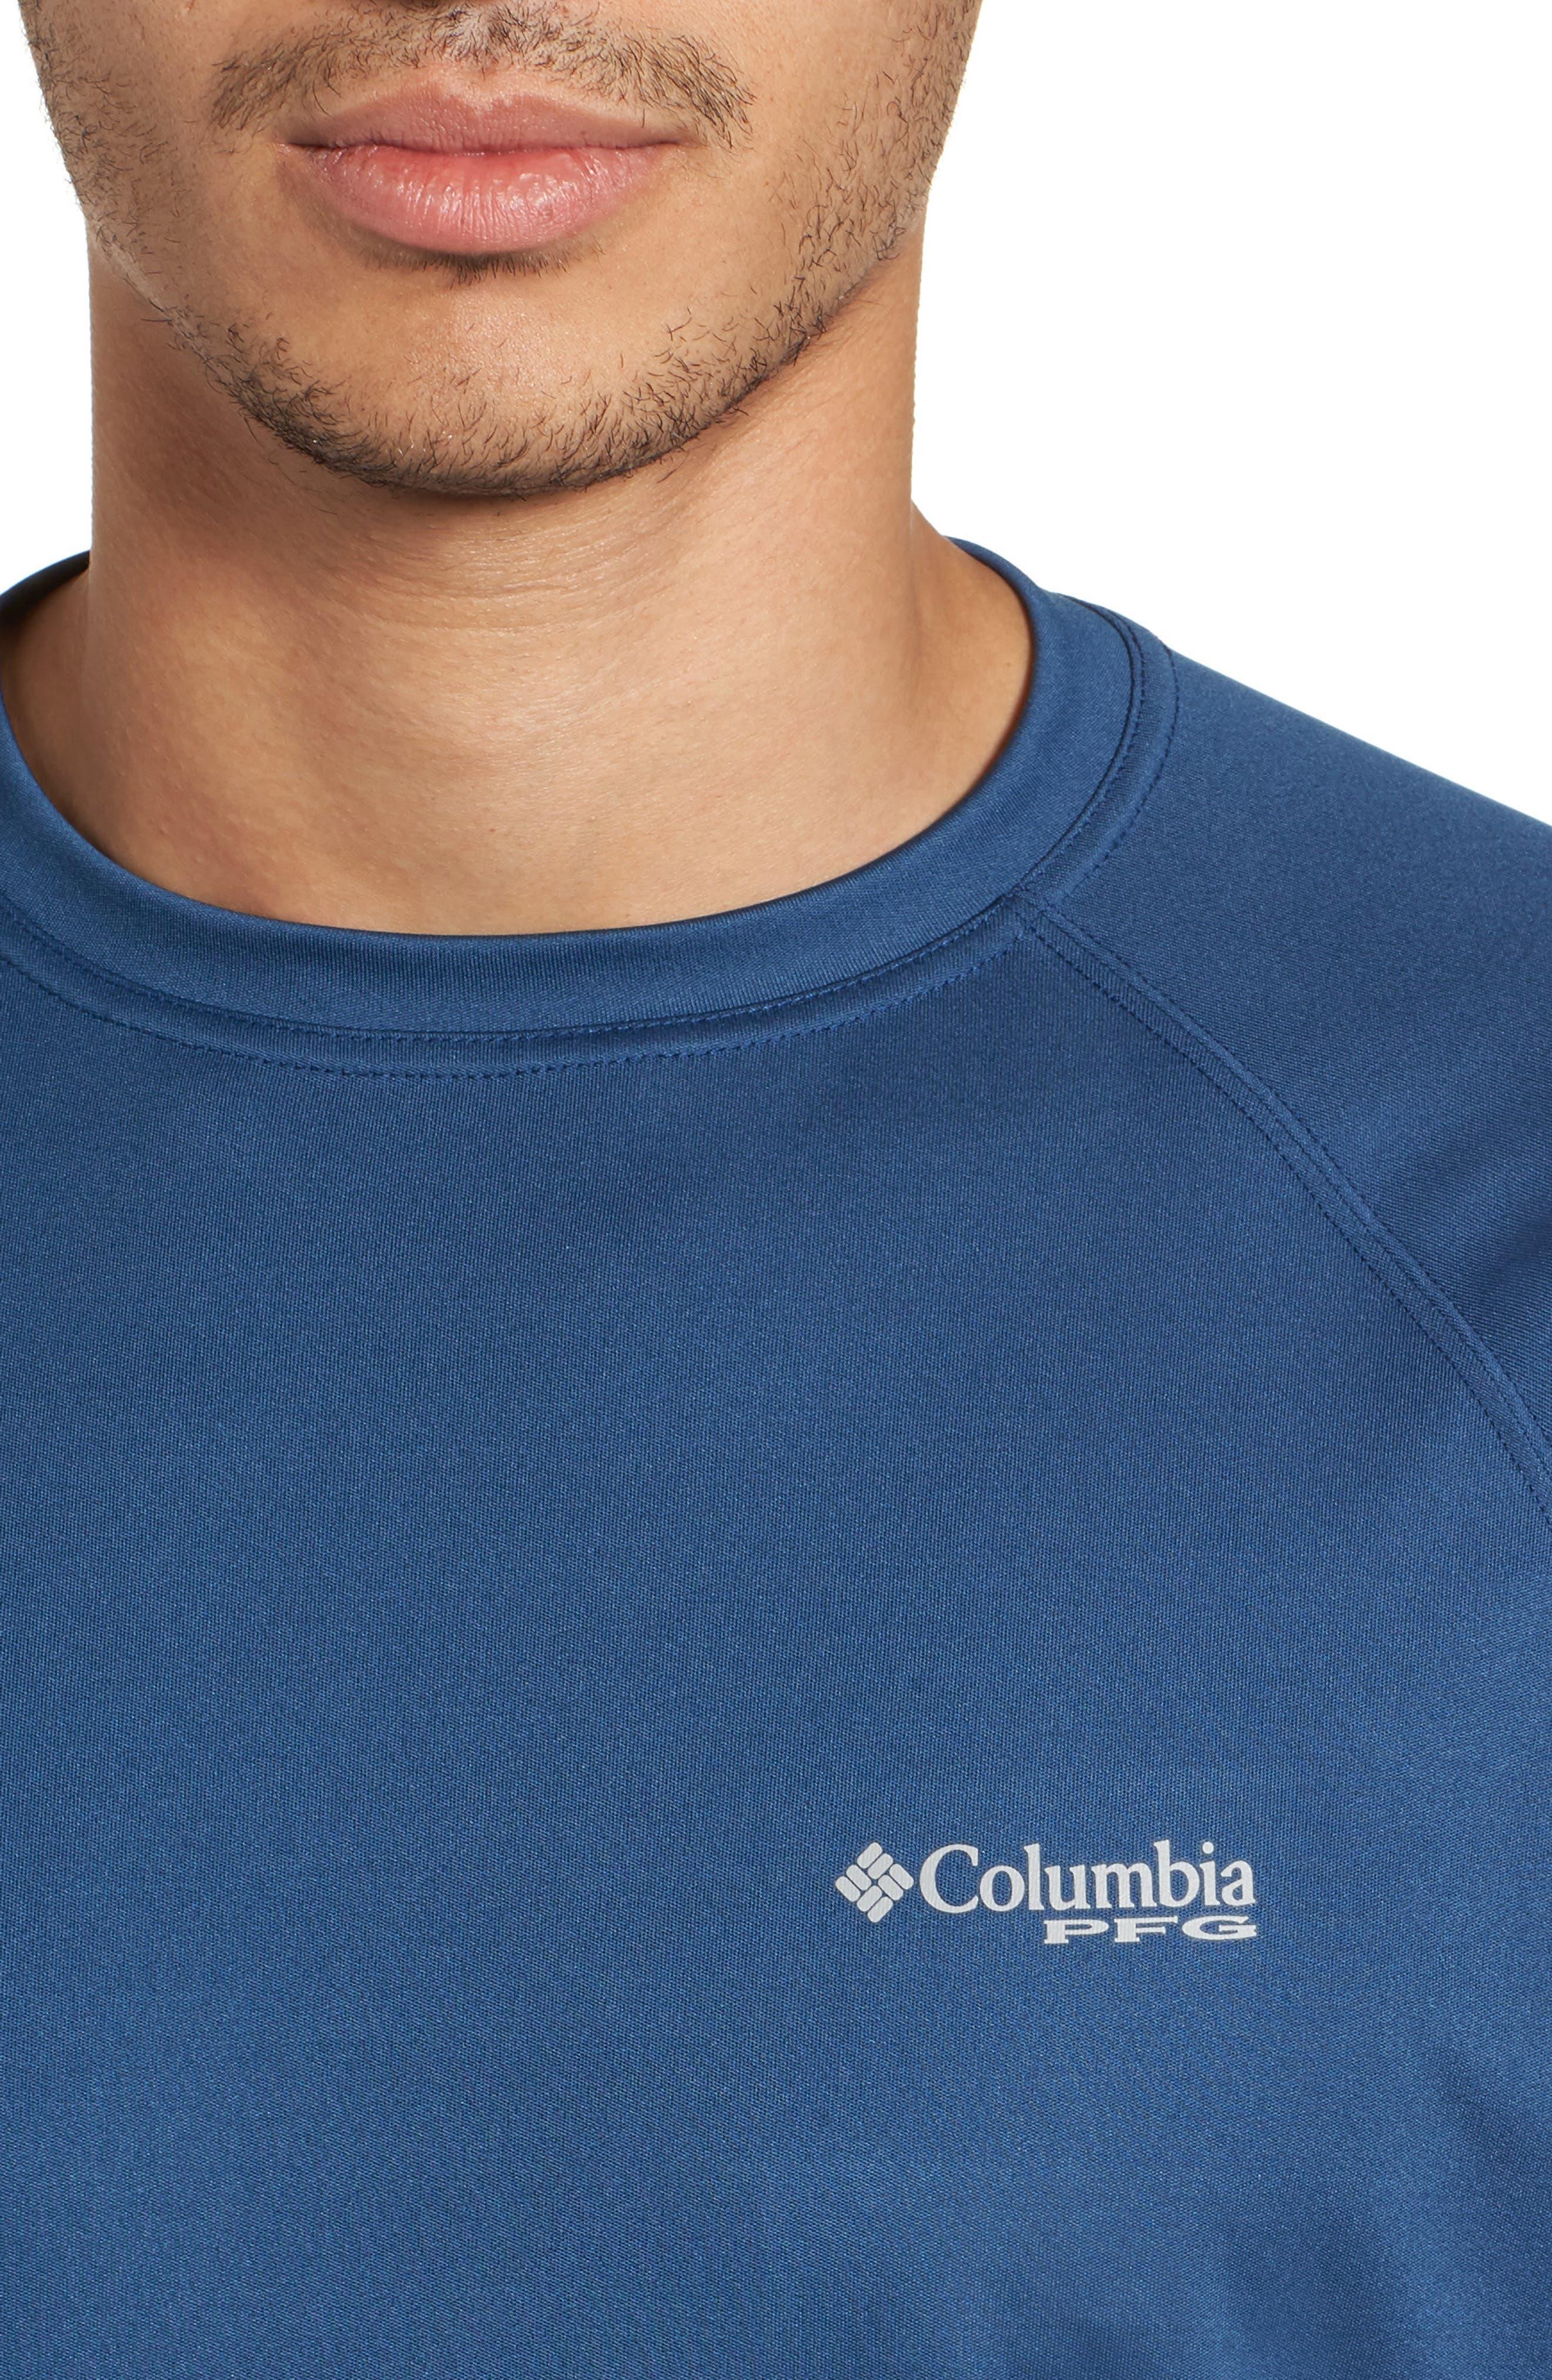 PFG Terminal Tackle Performance T-Shirt,                             Alternate thumbnail 24, color,